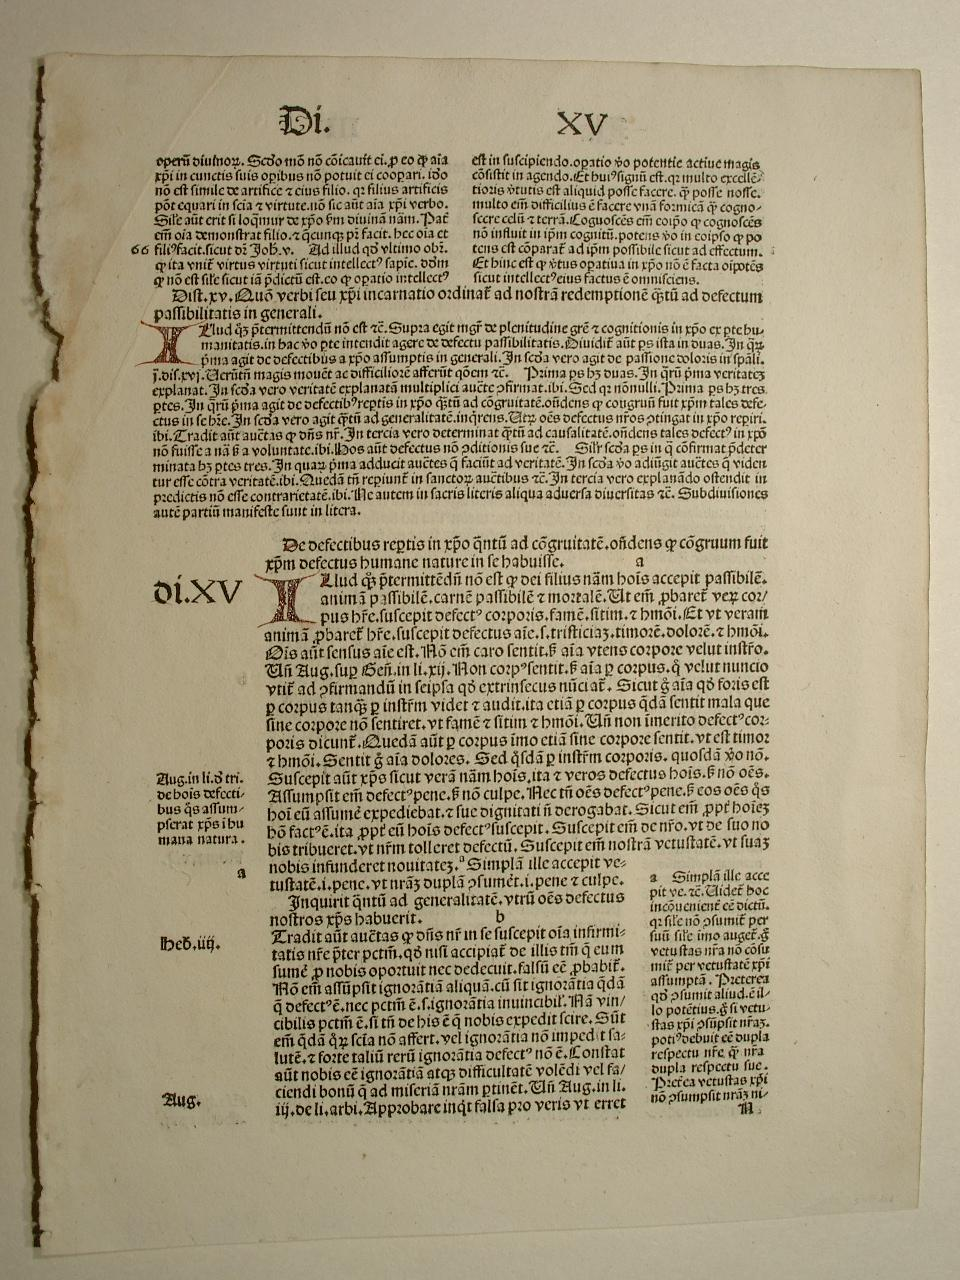 Sententiarum libri III, Di. XV (GWM 32527,: Petrus Lombardus: